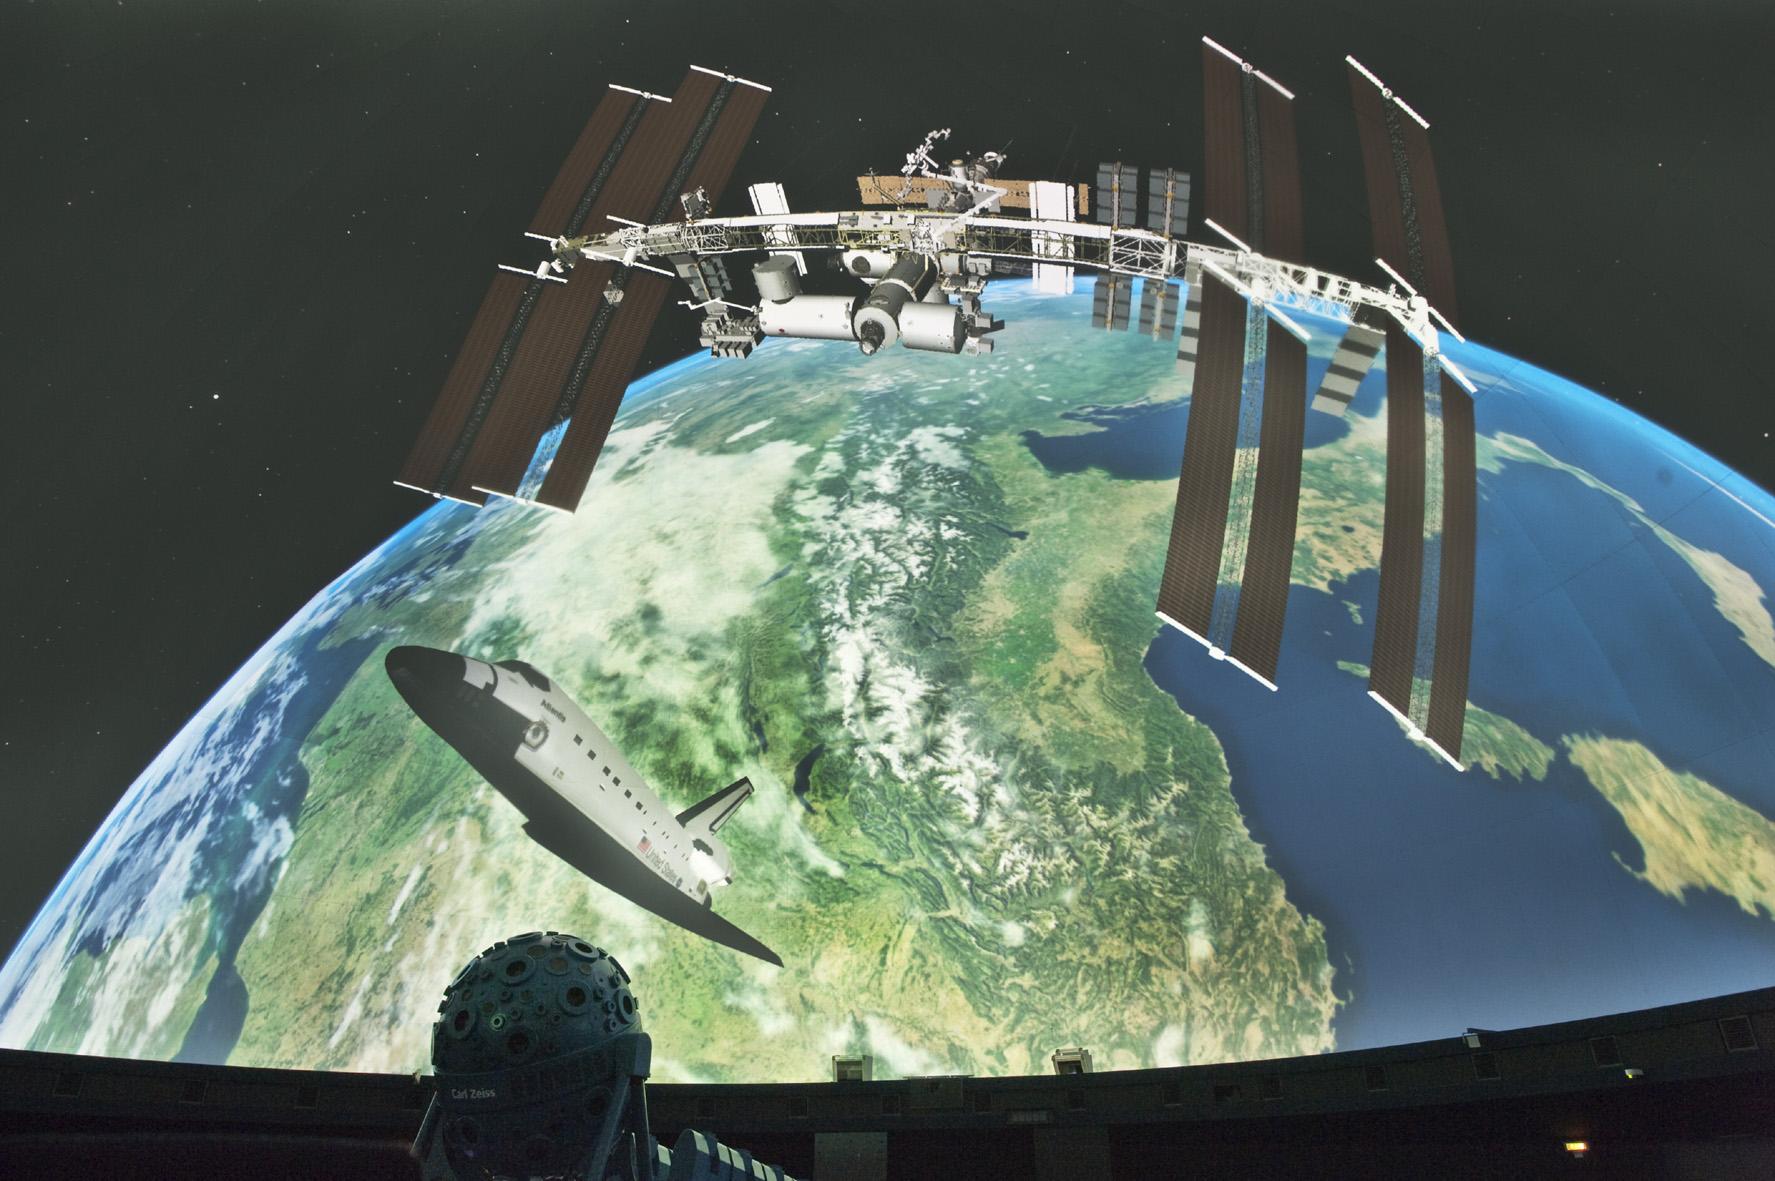 Bilddatei: Faszination_Weltall_ISS(c)LWL,Oblonczyk.jpg